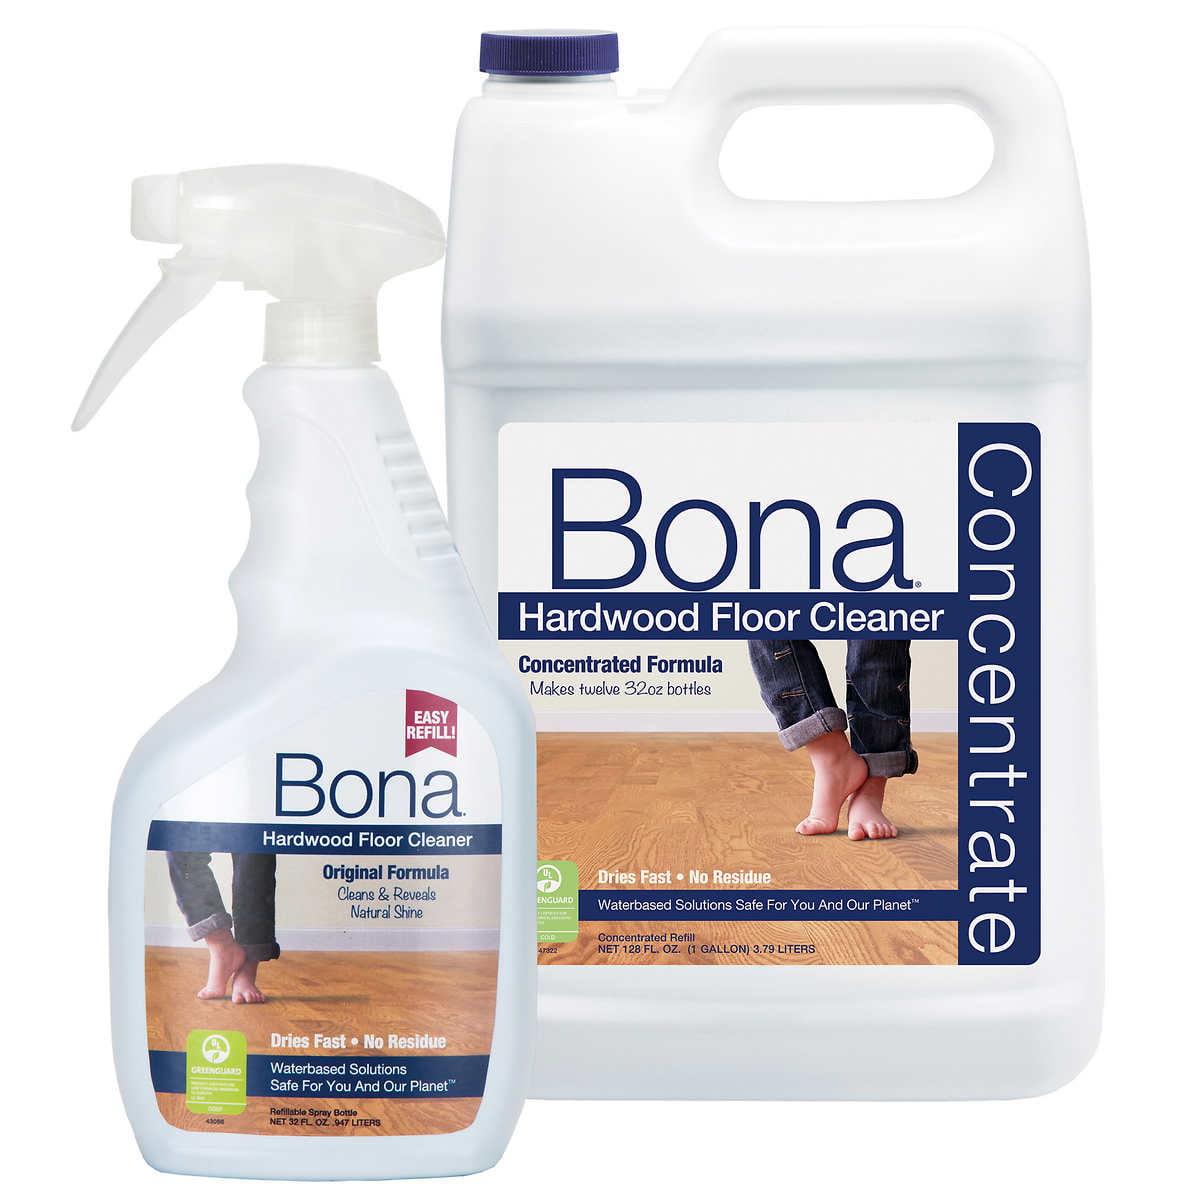 Bona Hardwood Floor Cleaner Concentrate